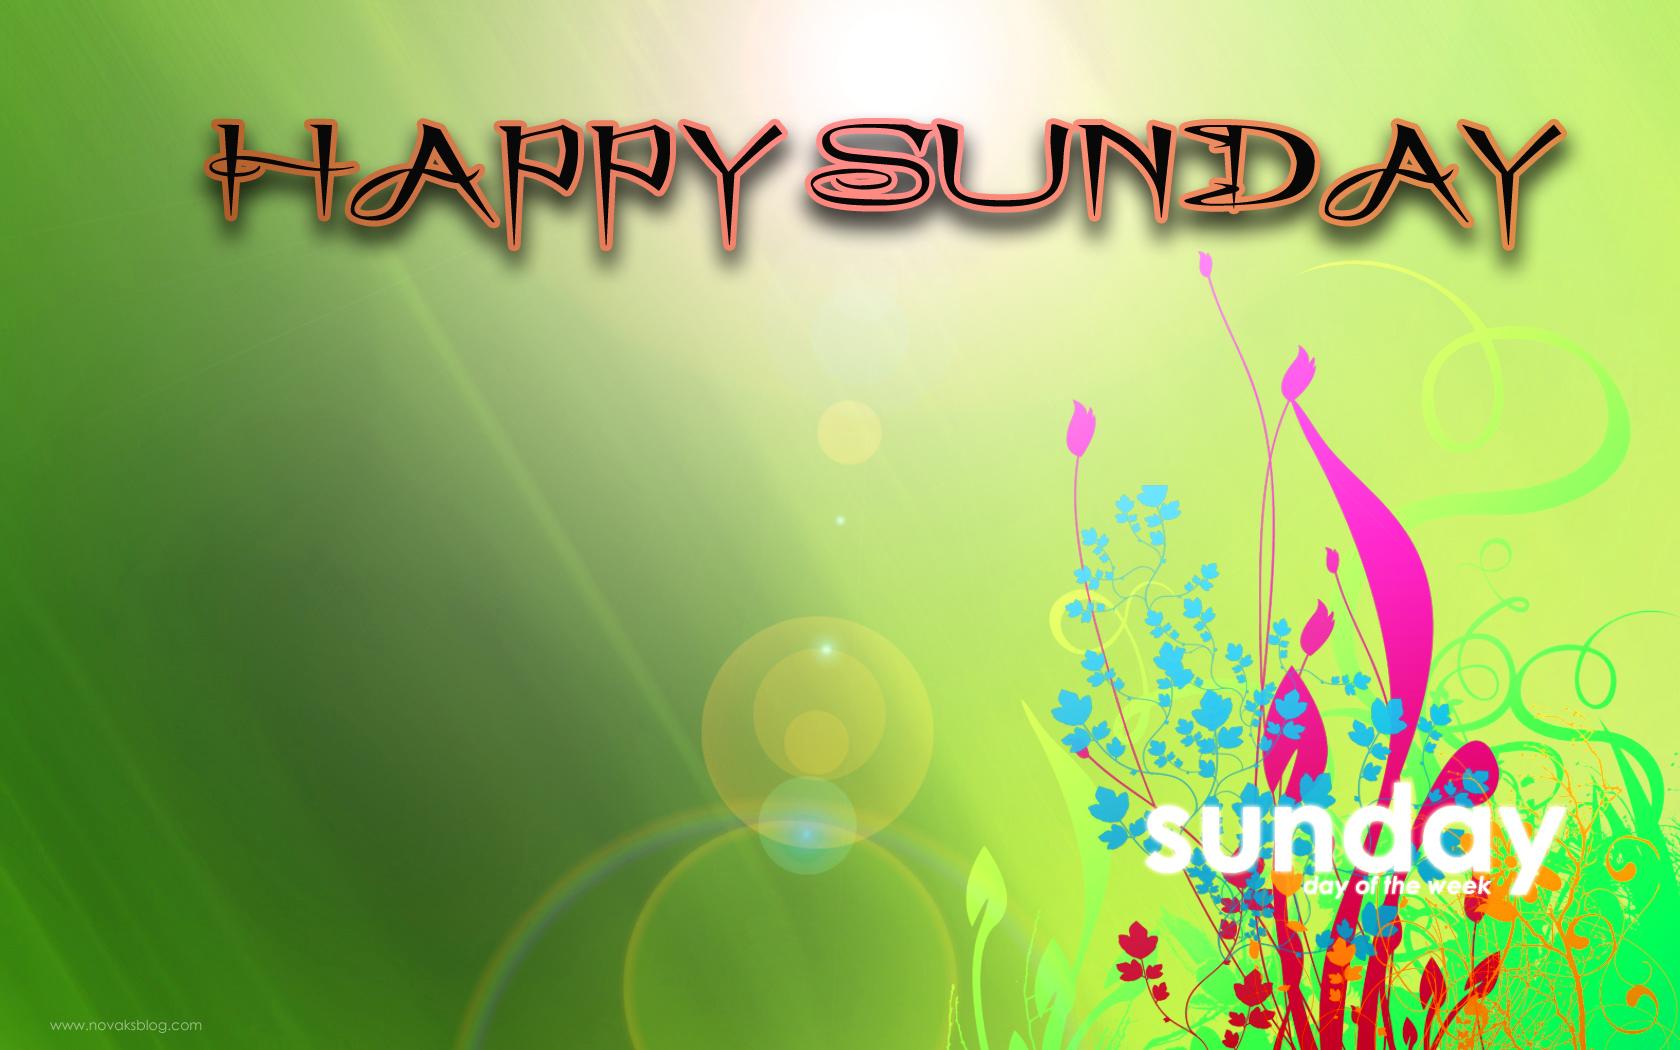 Happy-Sunday-Wallpaper-webstudy.pk